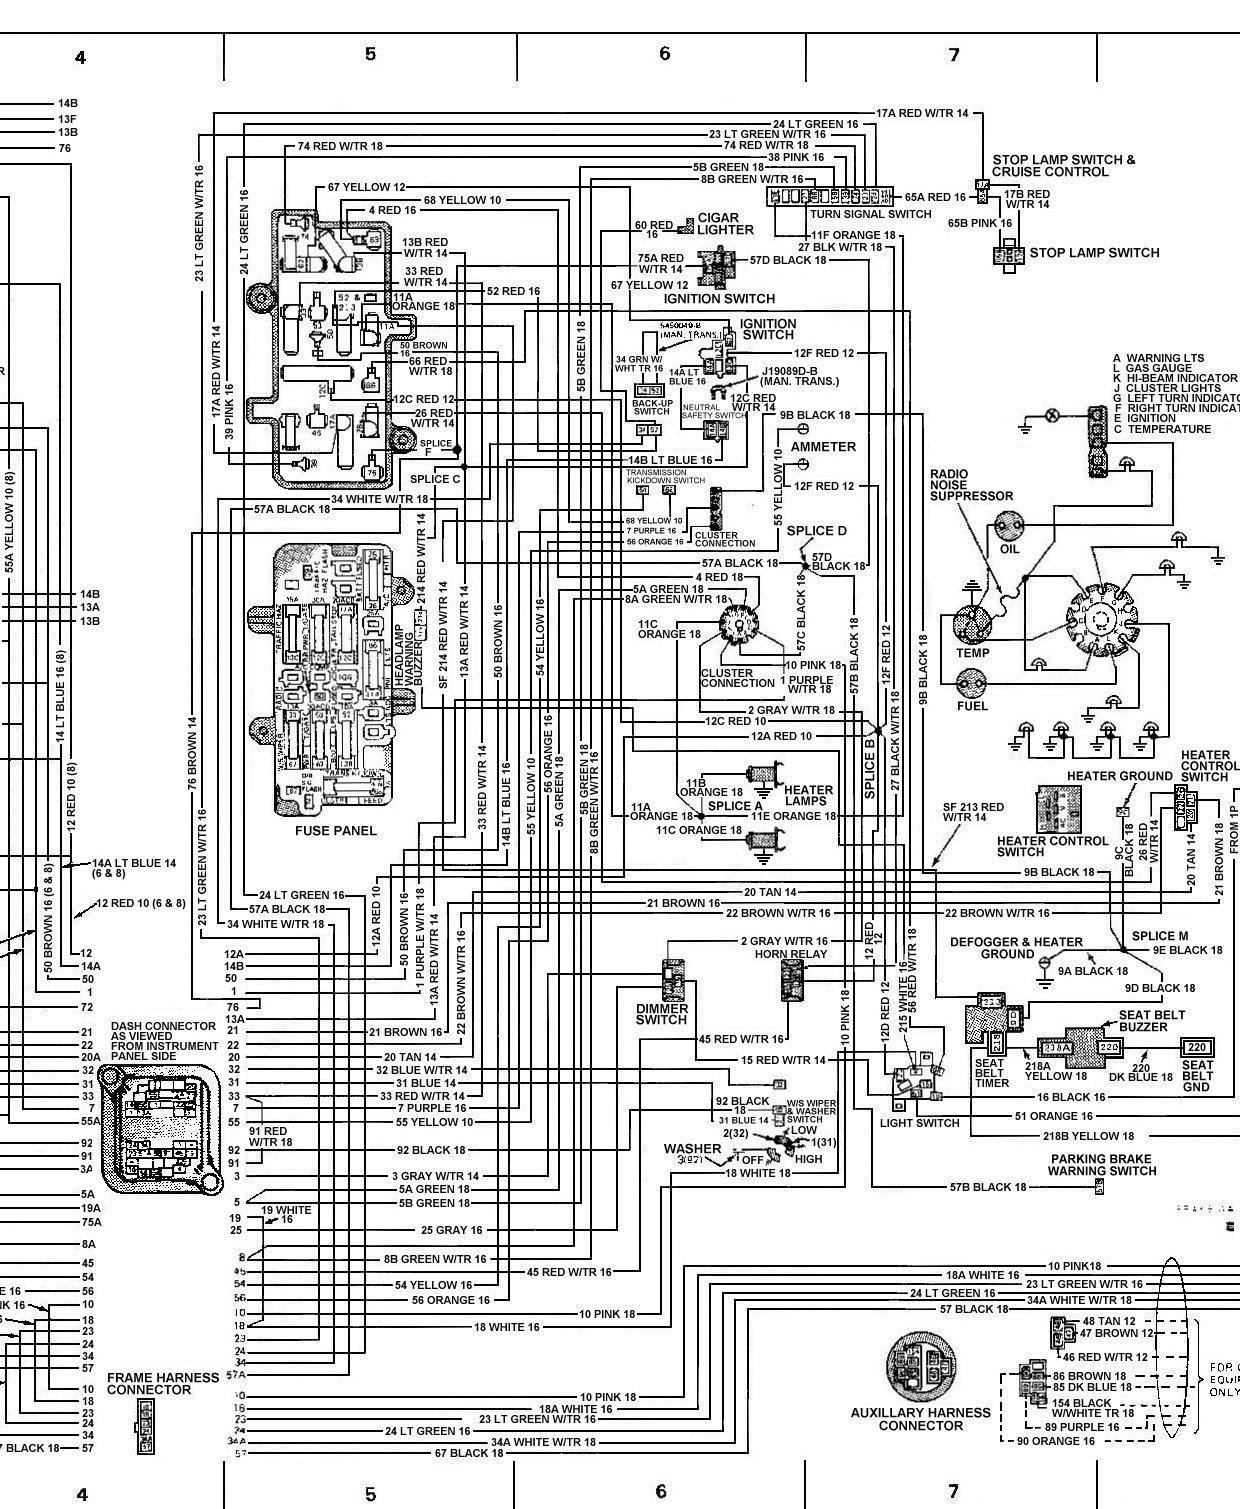 Wiring Diagram For 2004 Dodge Ram 1500 | Wiring Diagram - 2004 Dodge Ram 1500 Wiring Diagram